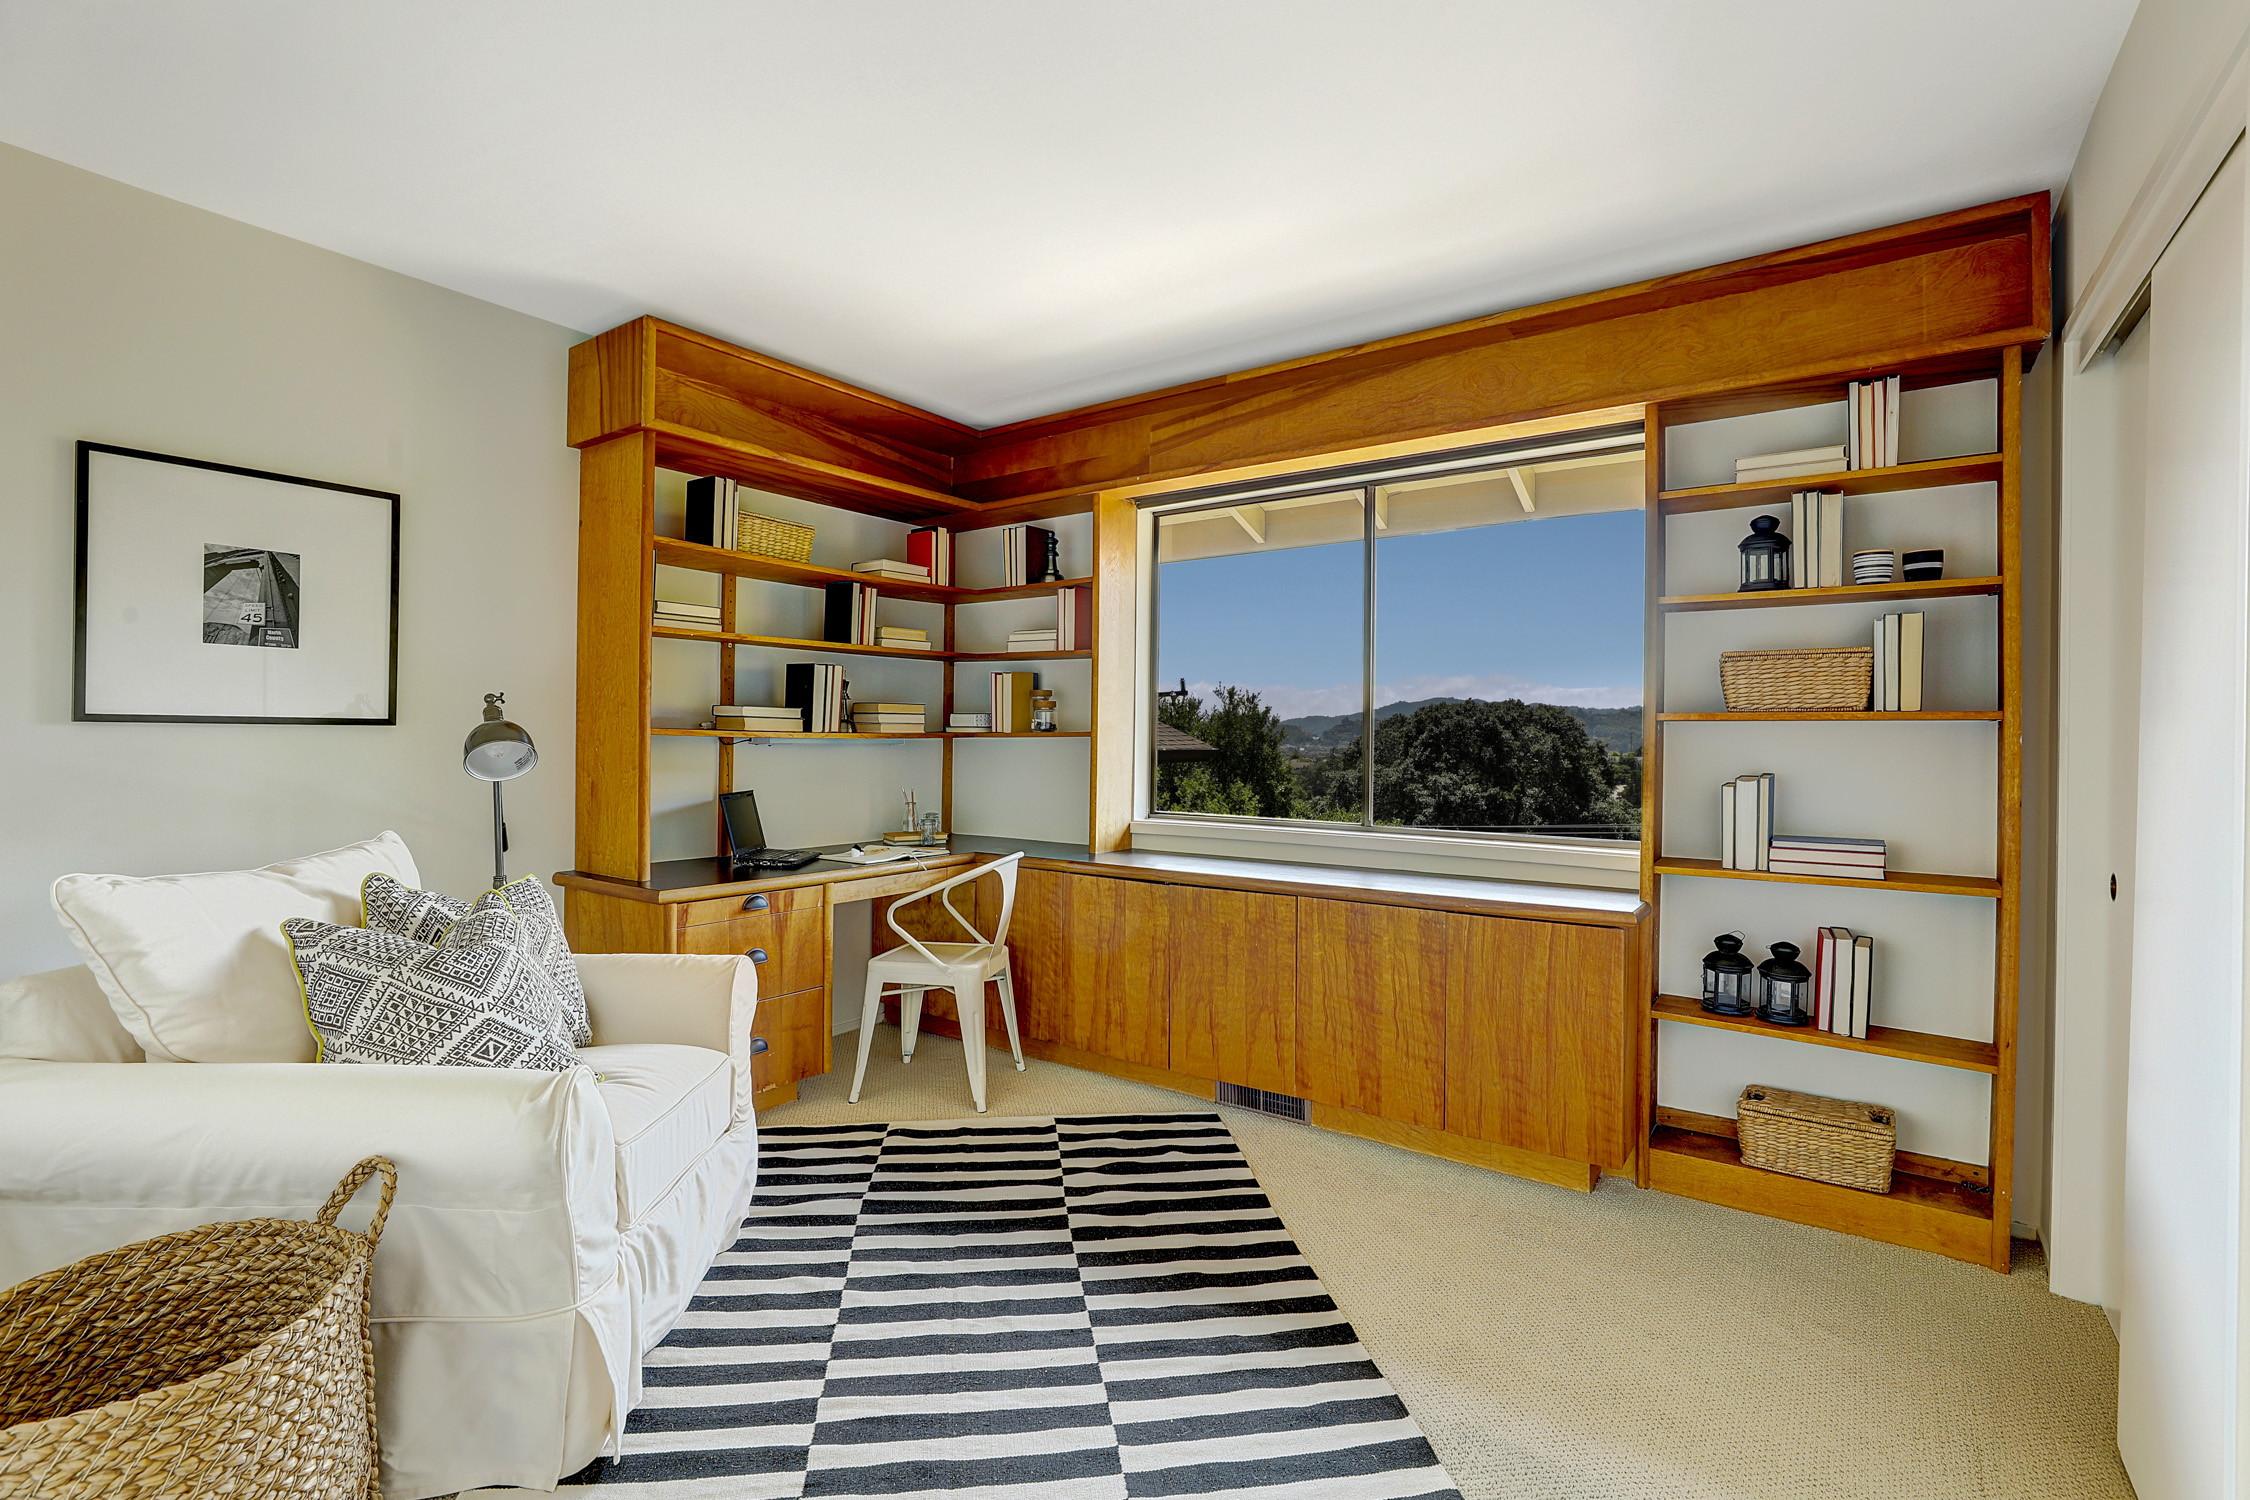 16Dorian 46 MLSSan Rafael Real Estate - Listed by Julia Fitzpatrick + Allie Fornesi Team Own Marin County .jpg